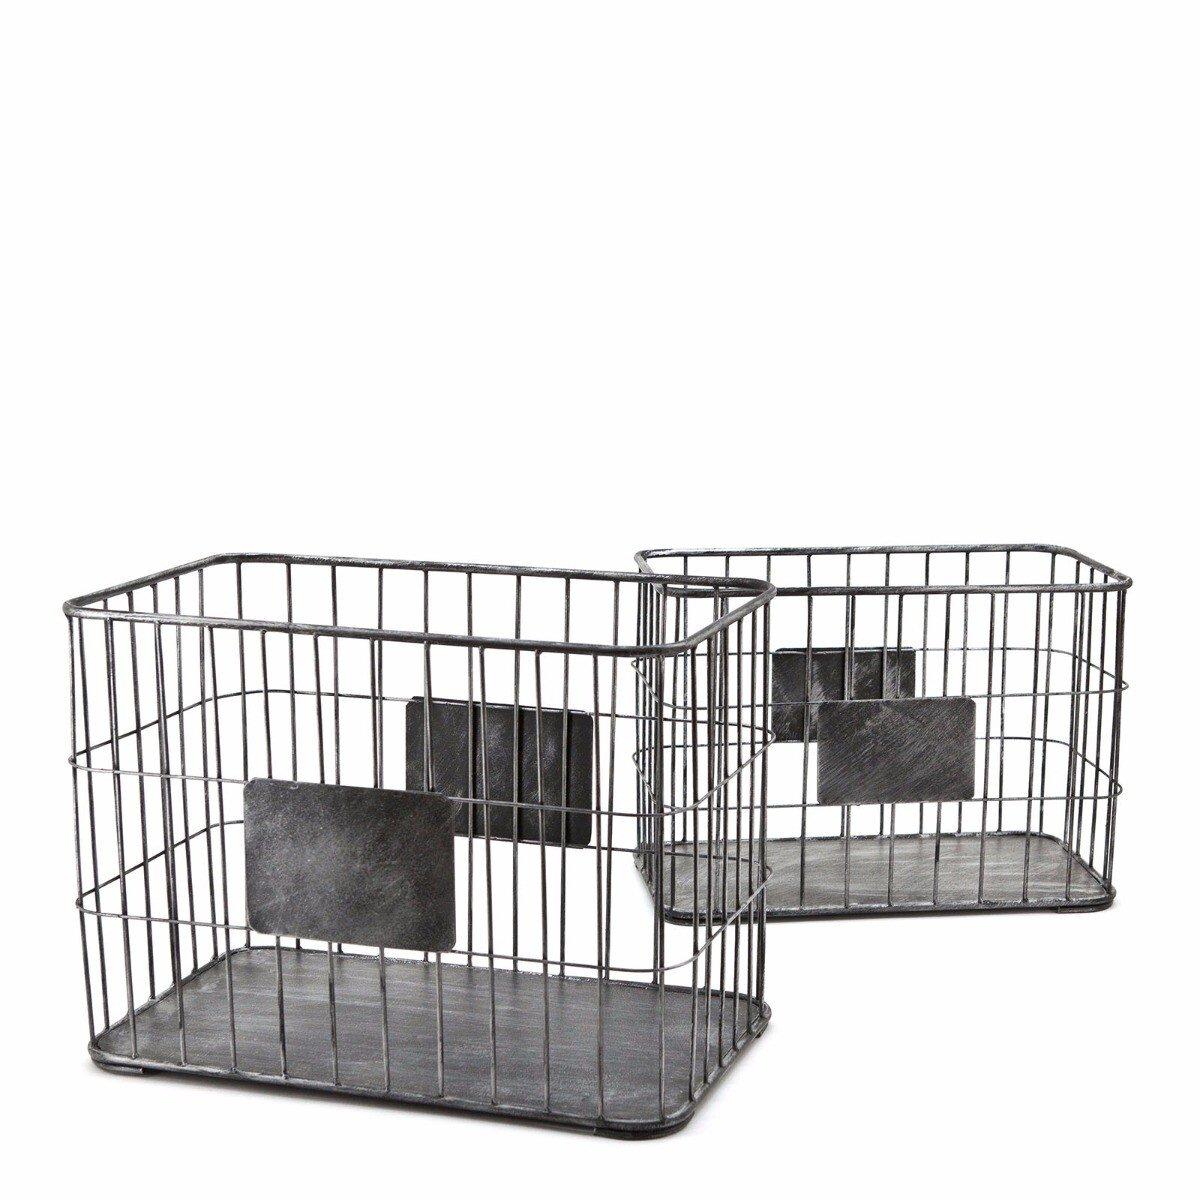 By Boo basket set large 31x45x25 - 36x50x30cm